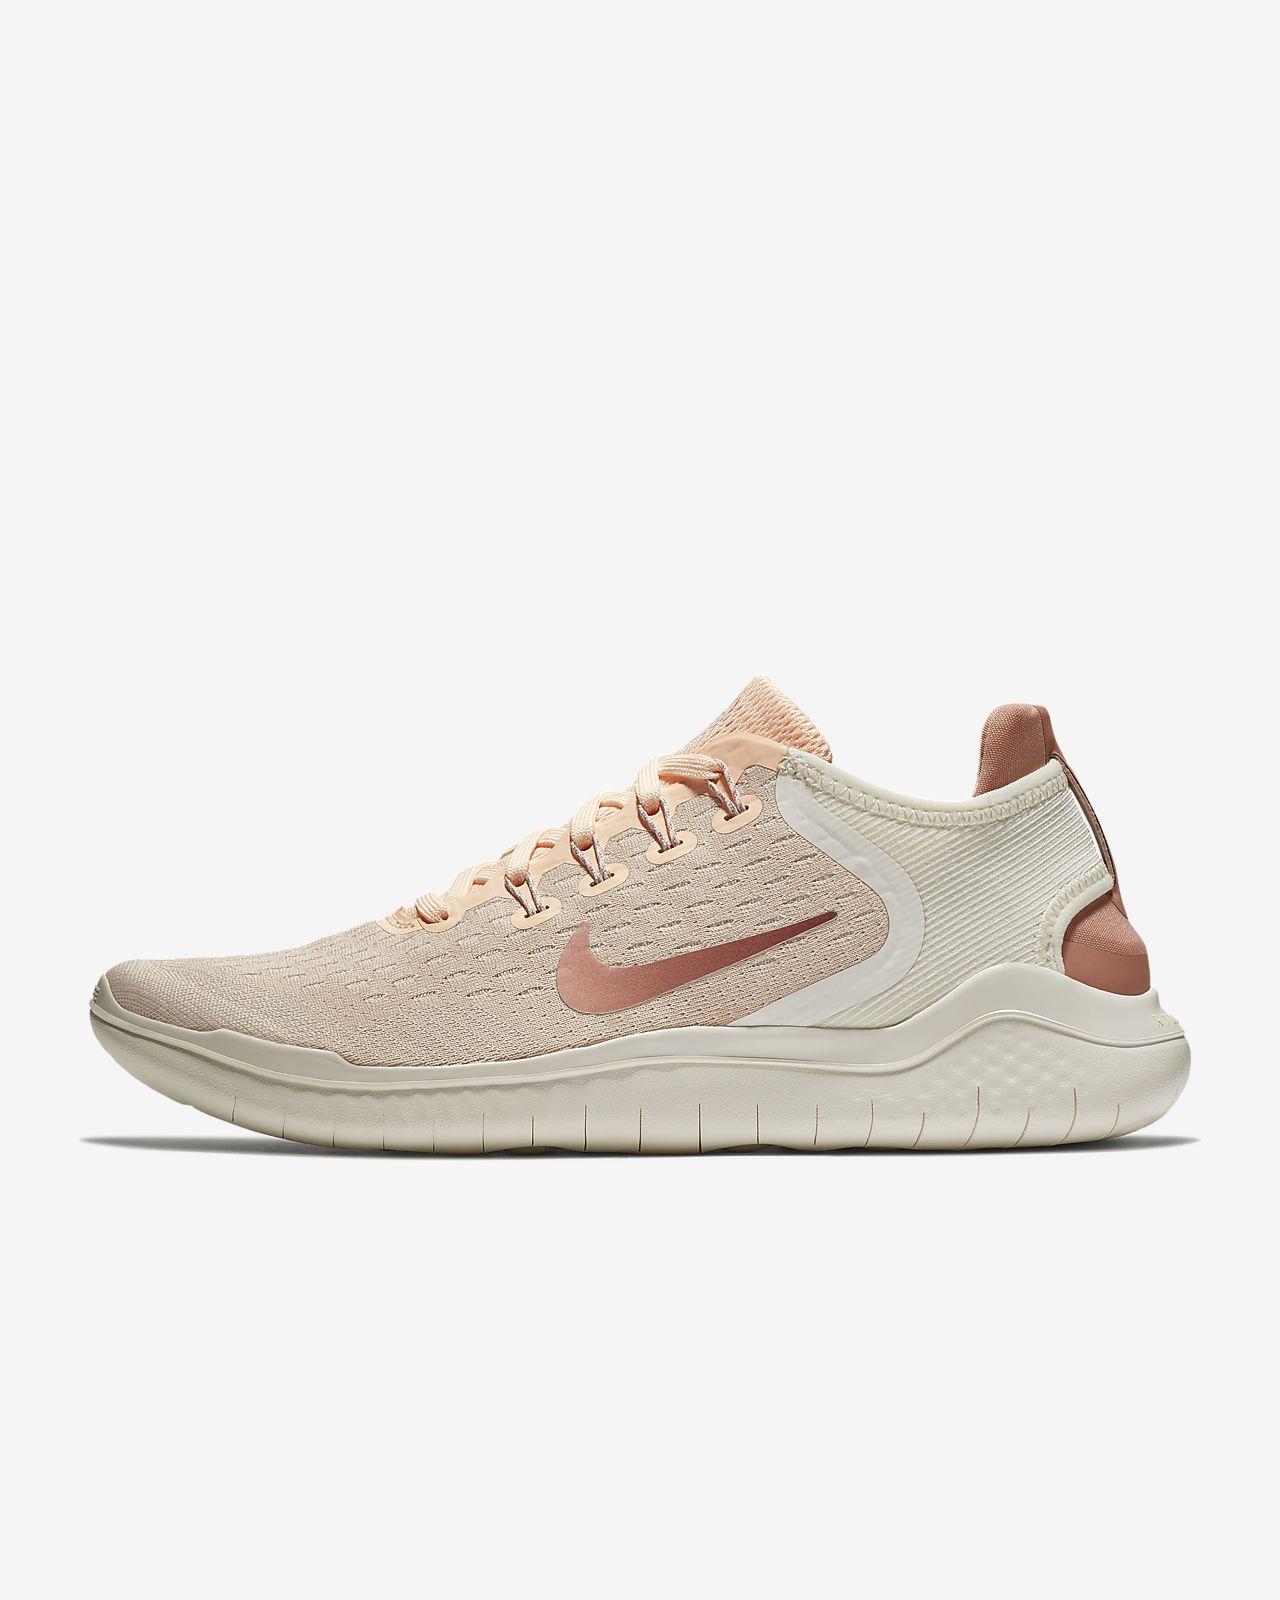 Chaussure de running Nike Free RN 2018 pour Femme